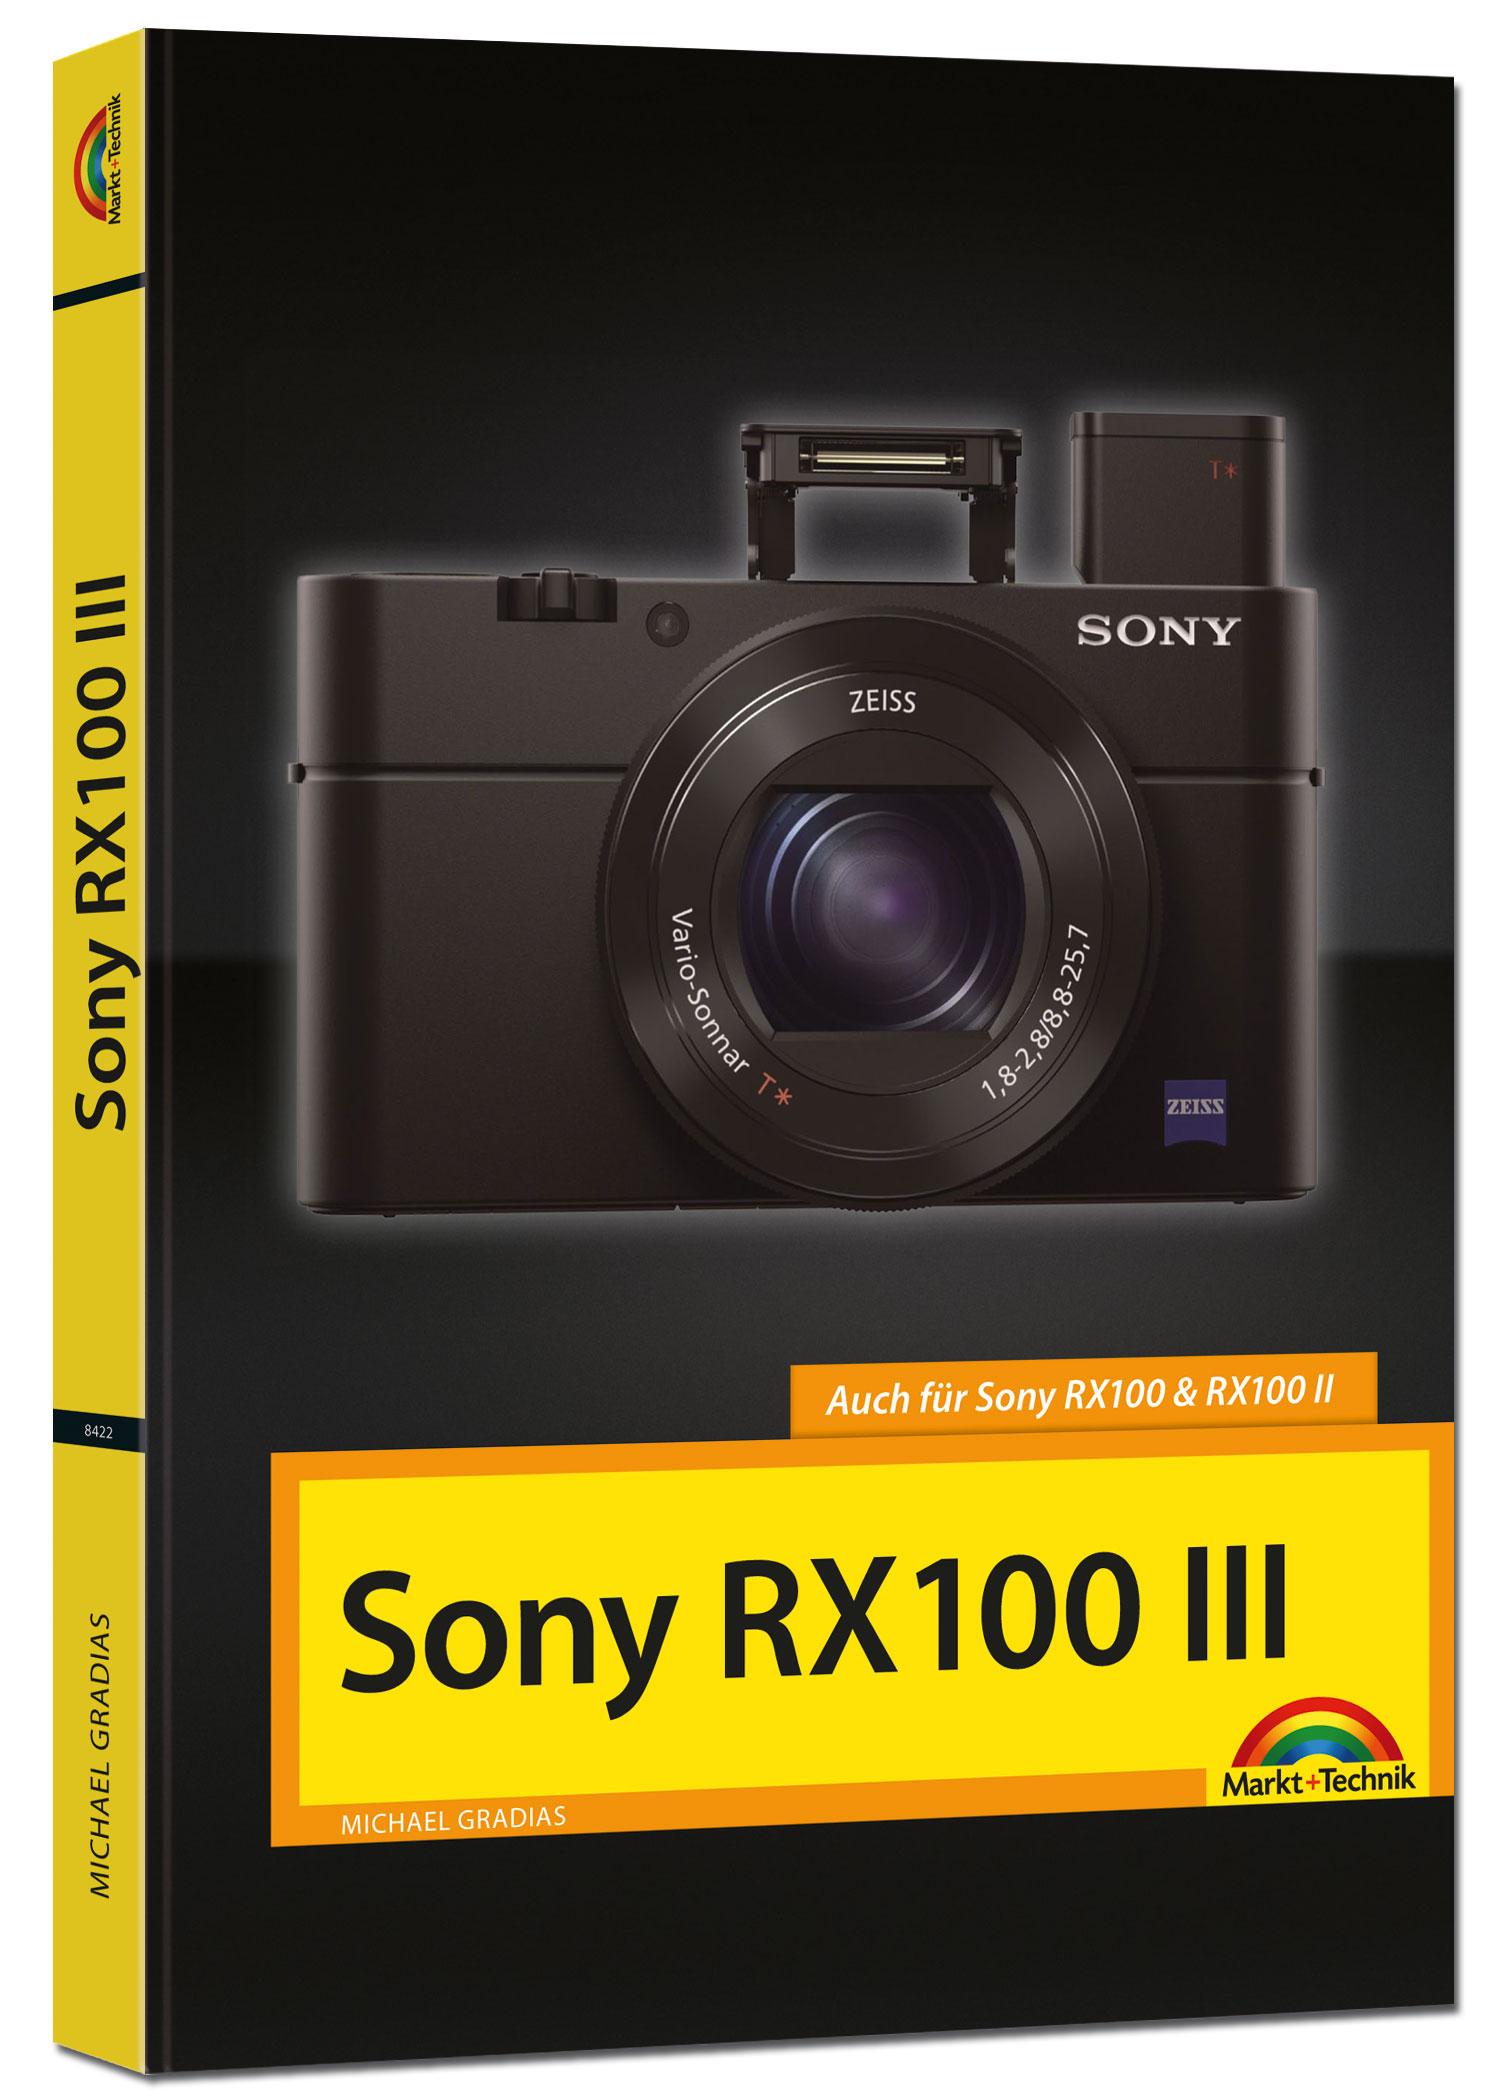 SONY RX100 III Handbuch - Michael Gradias [Gebundene Ausgabe]